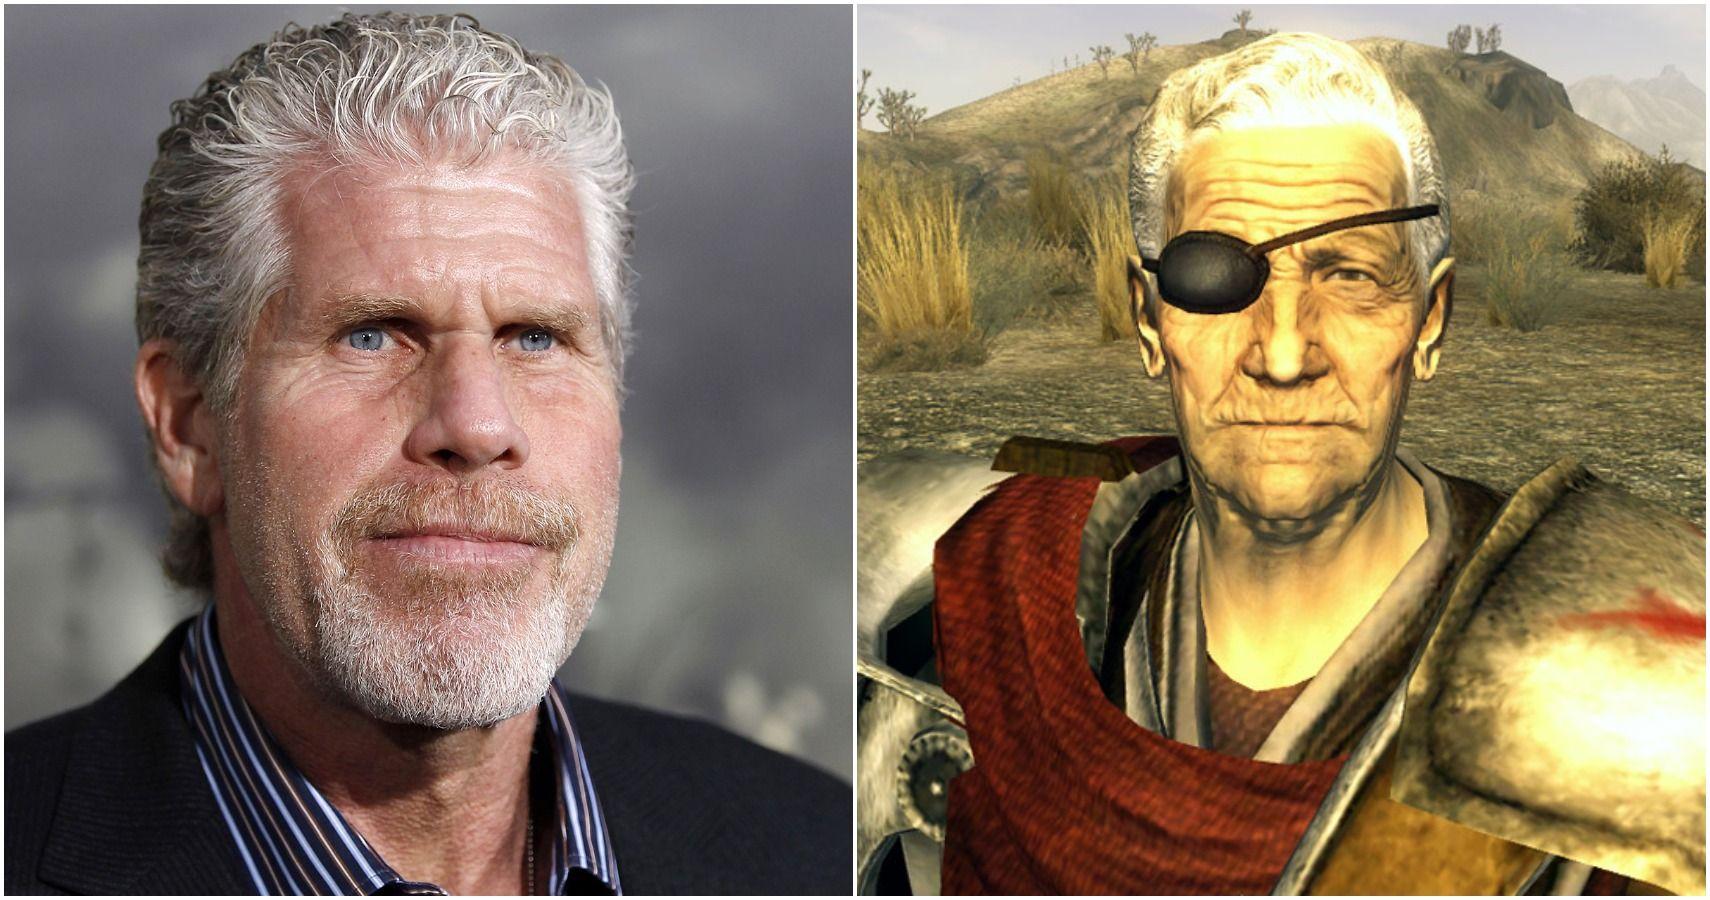 Fallout: New Vegas Has A Ron Perlman 'Narrator' Character Model